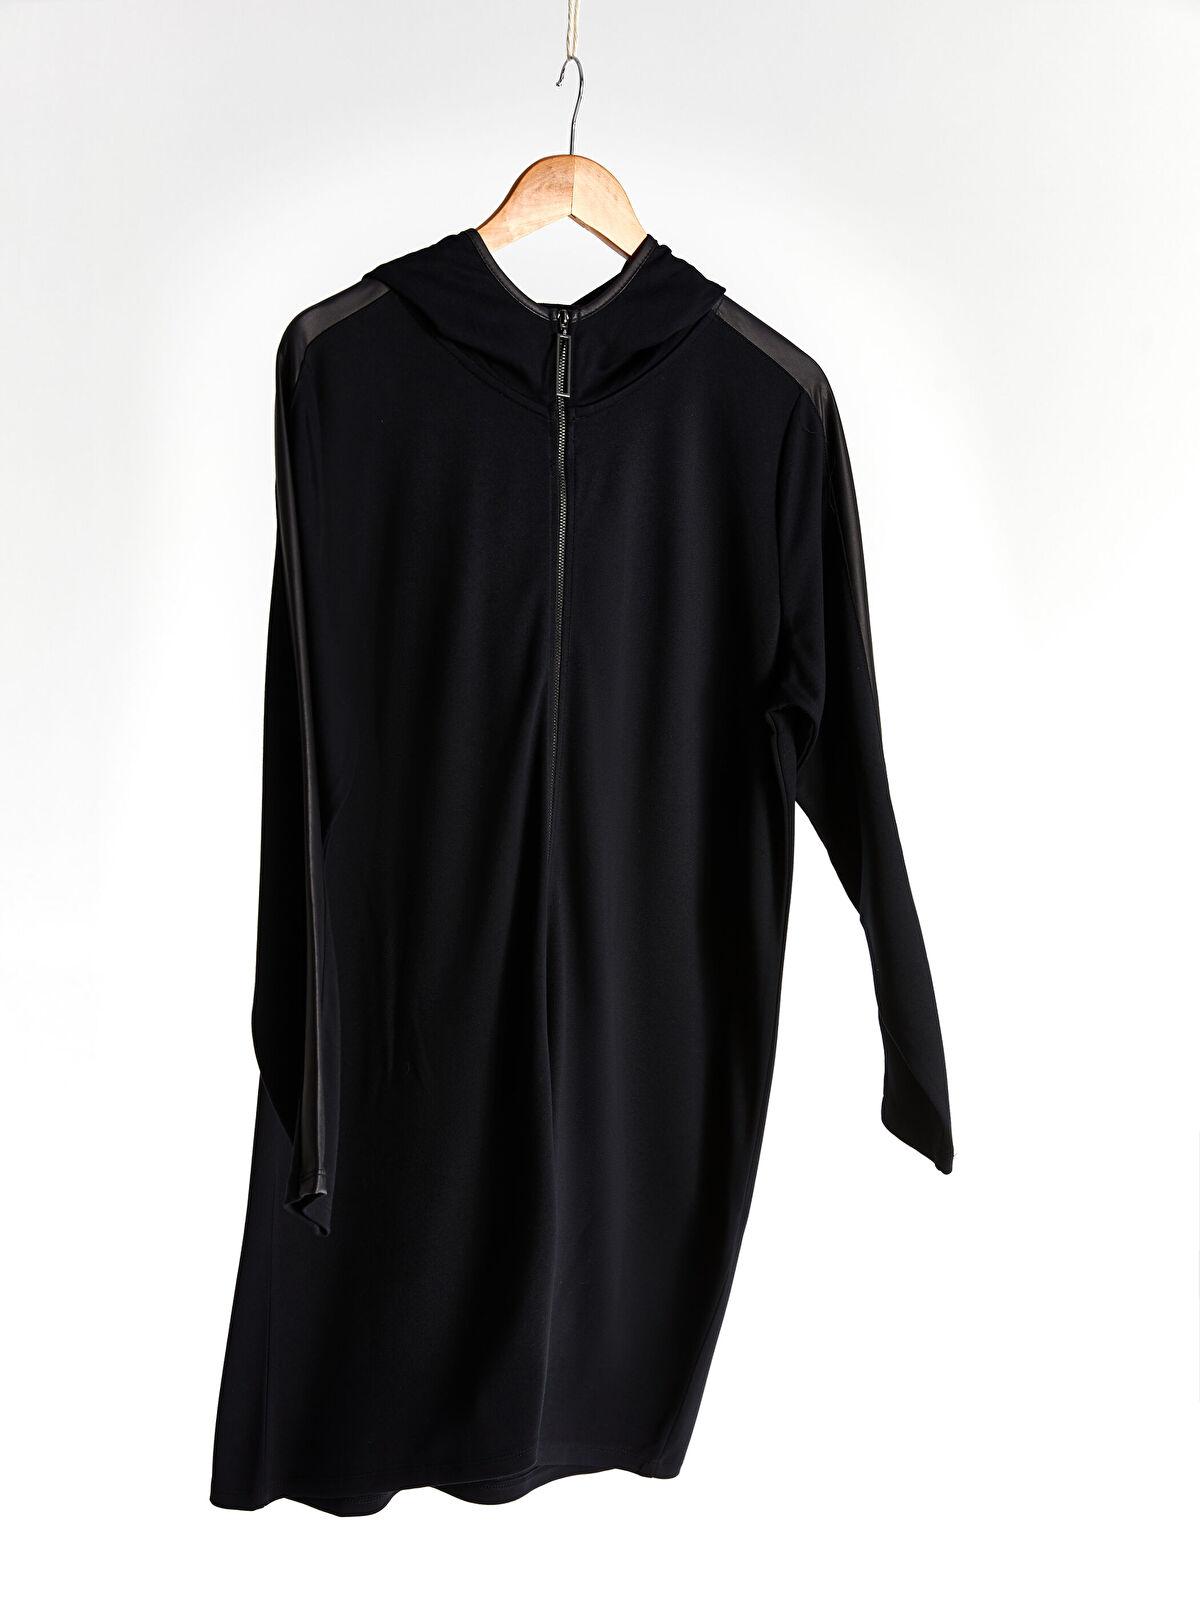 Kapüşonlu Fermuarlı Sweatshirt - LC WAIKIKI